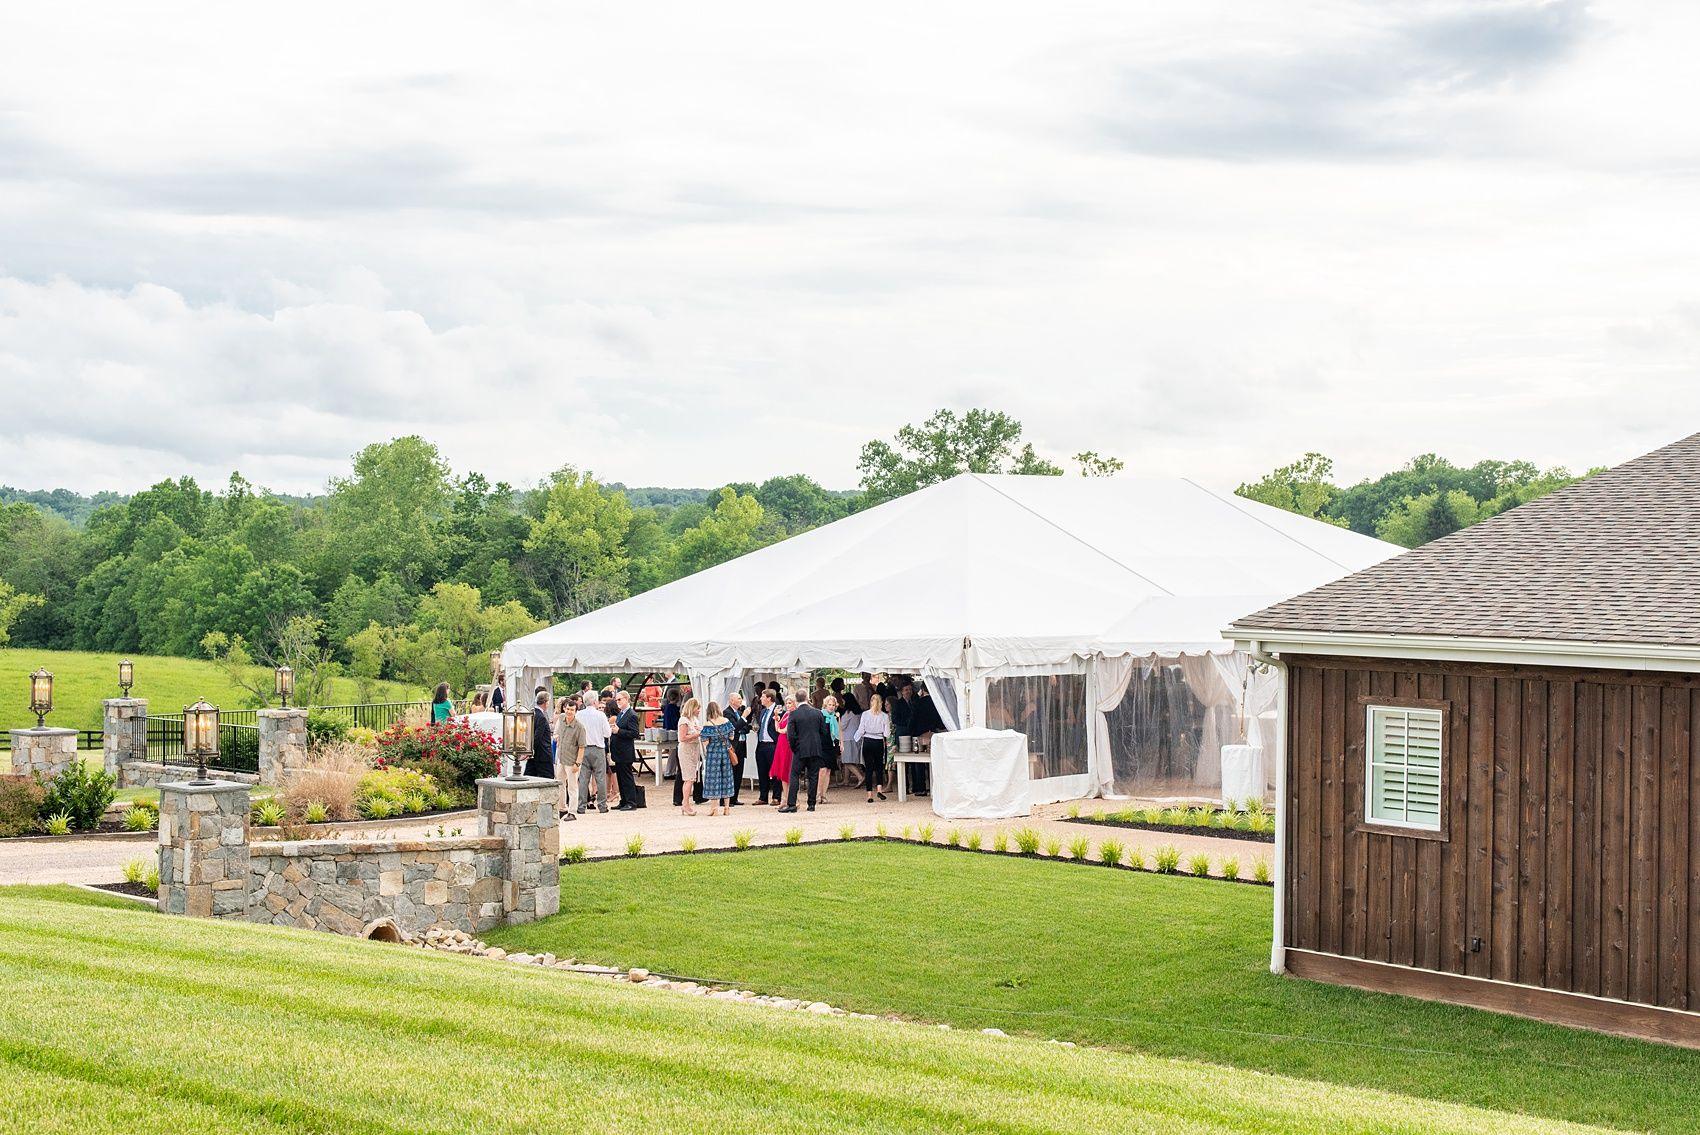 Wedding Photos At The Lodge At Mount Ida Farm Virginia Farm Wedding Photos Barn Wedding Decorations Wedding Photos